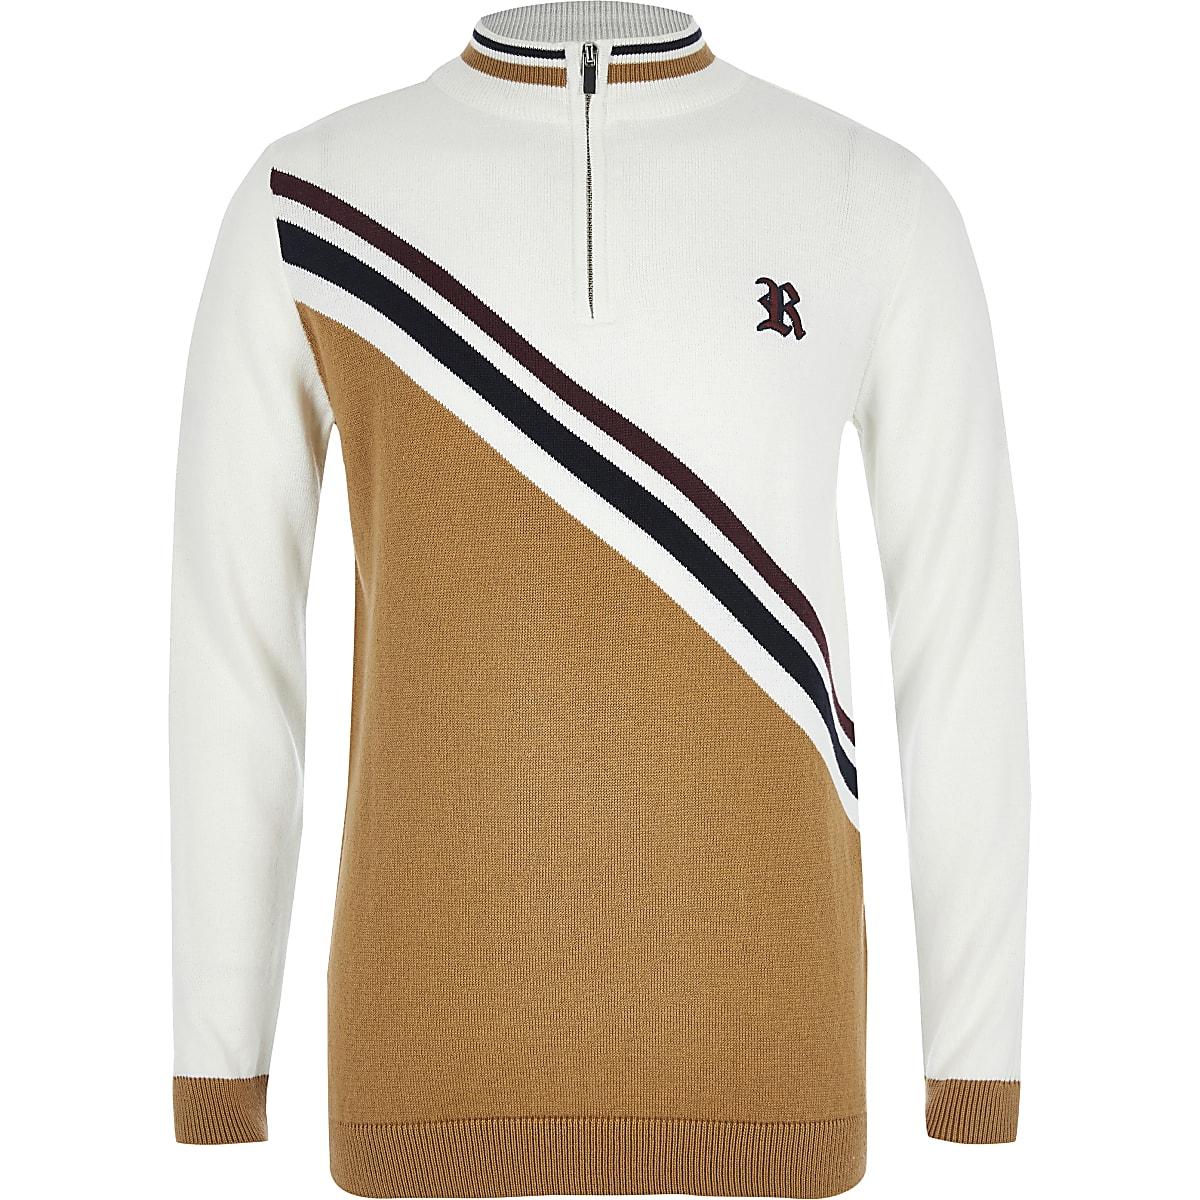 Boys light brown blocked half zip knitted top